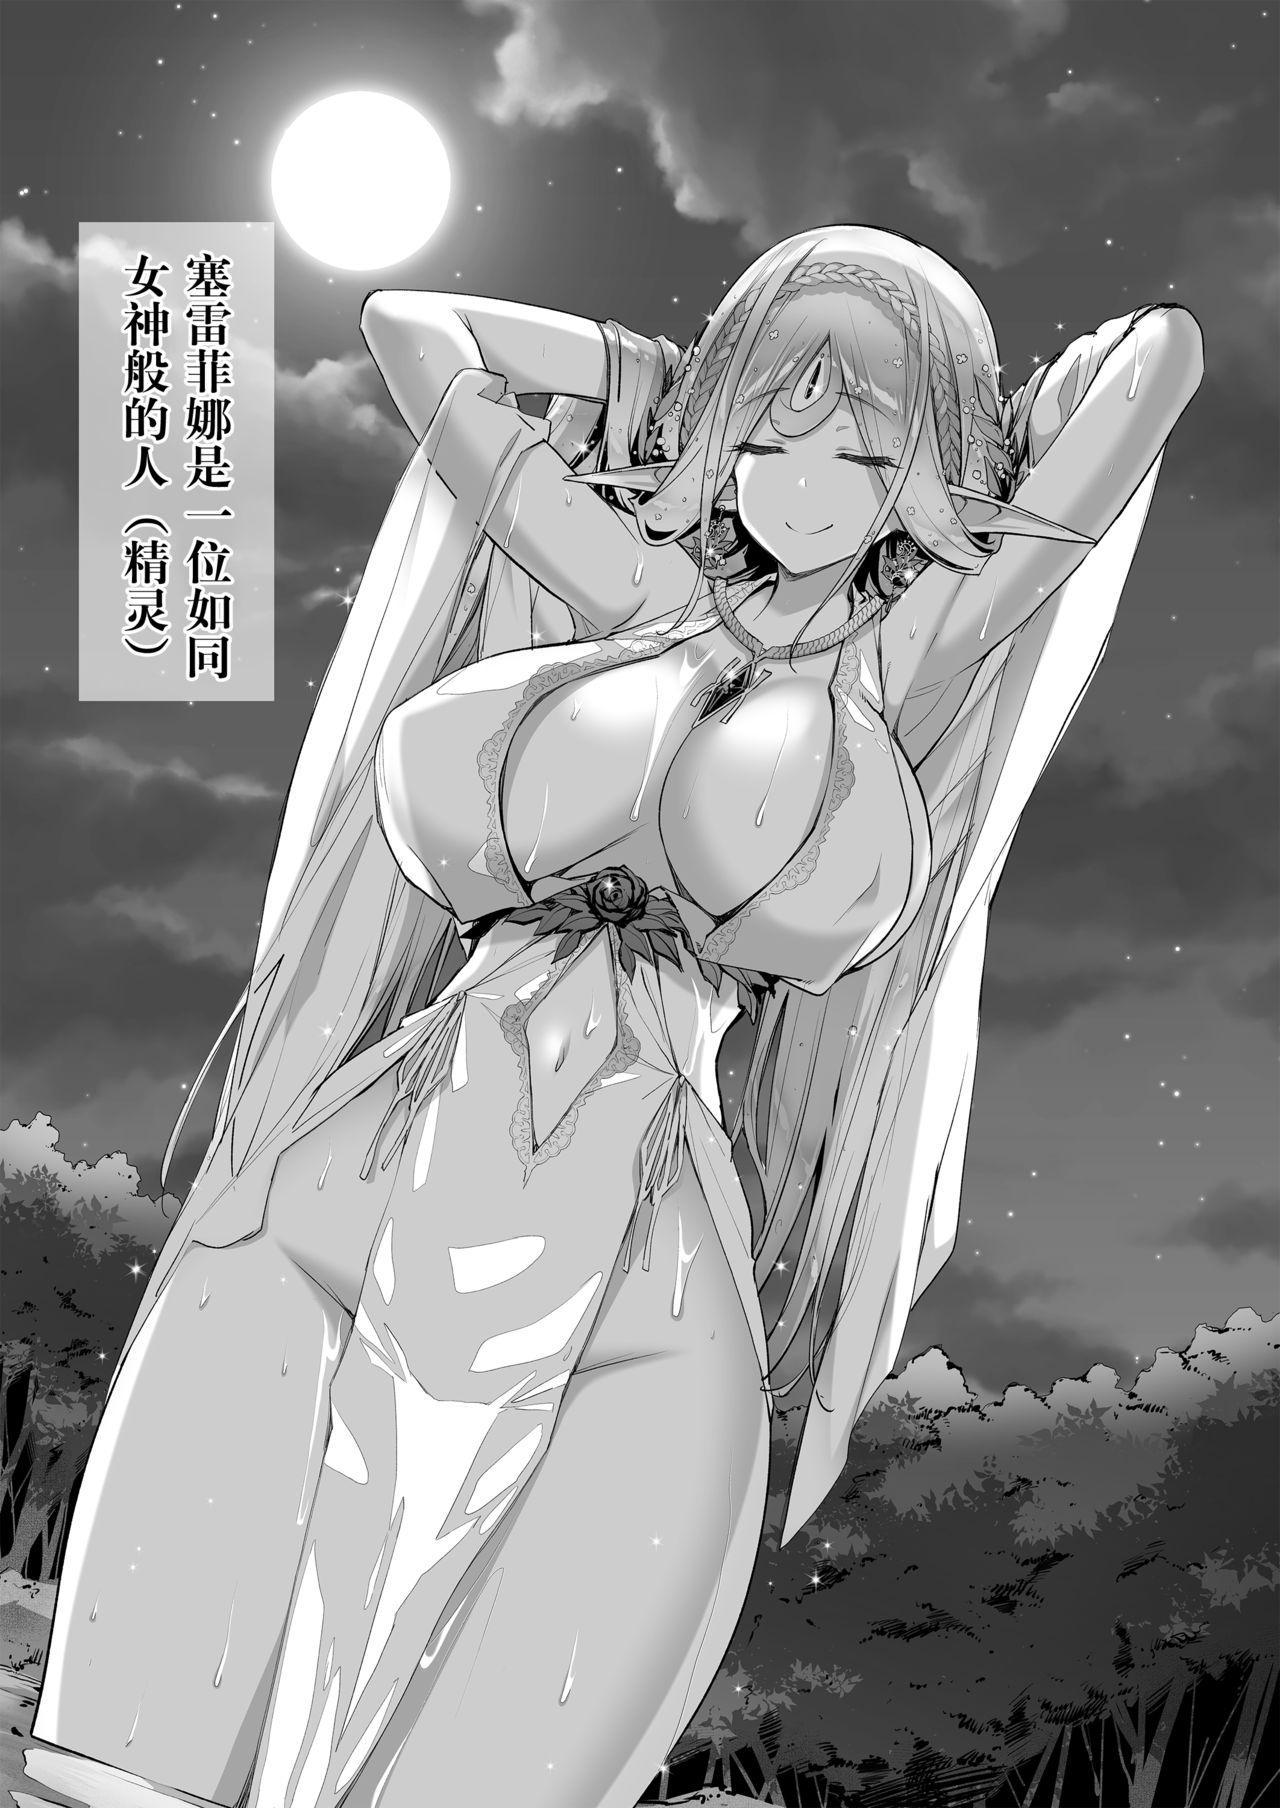 [Ichinose Land] Midara na Elf-san wa Orc-kun ga Osuki [Chinese] [新桥月白日语社] [Digital] 1